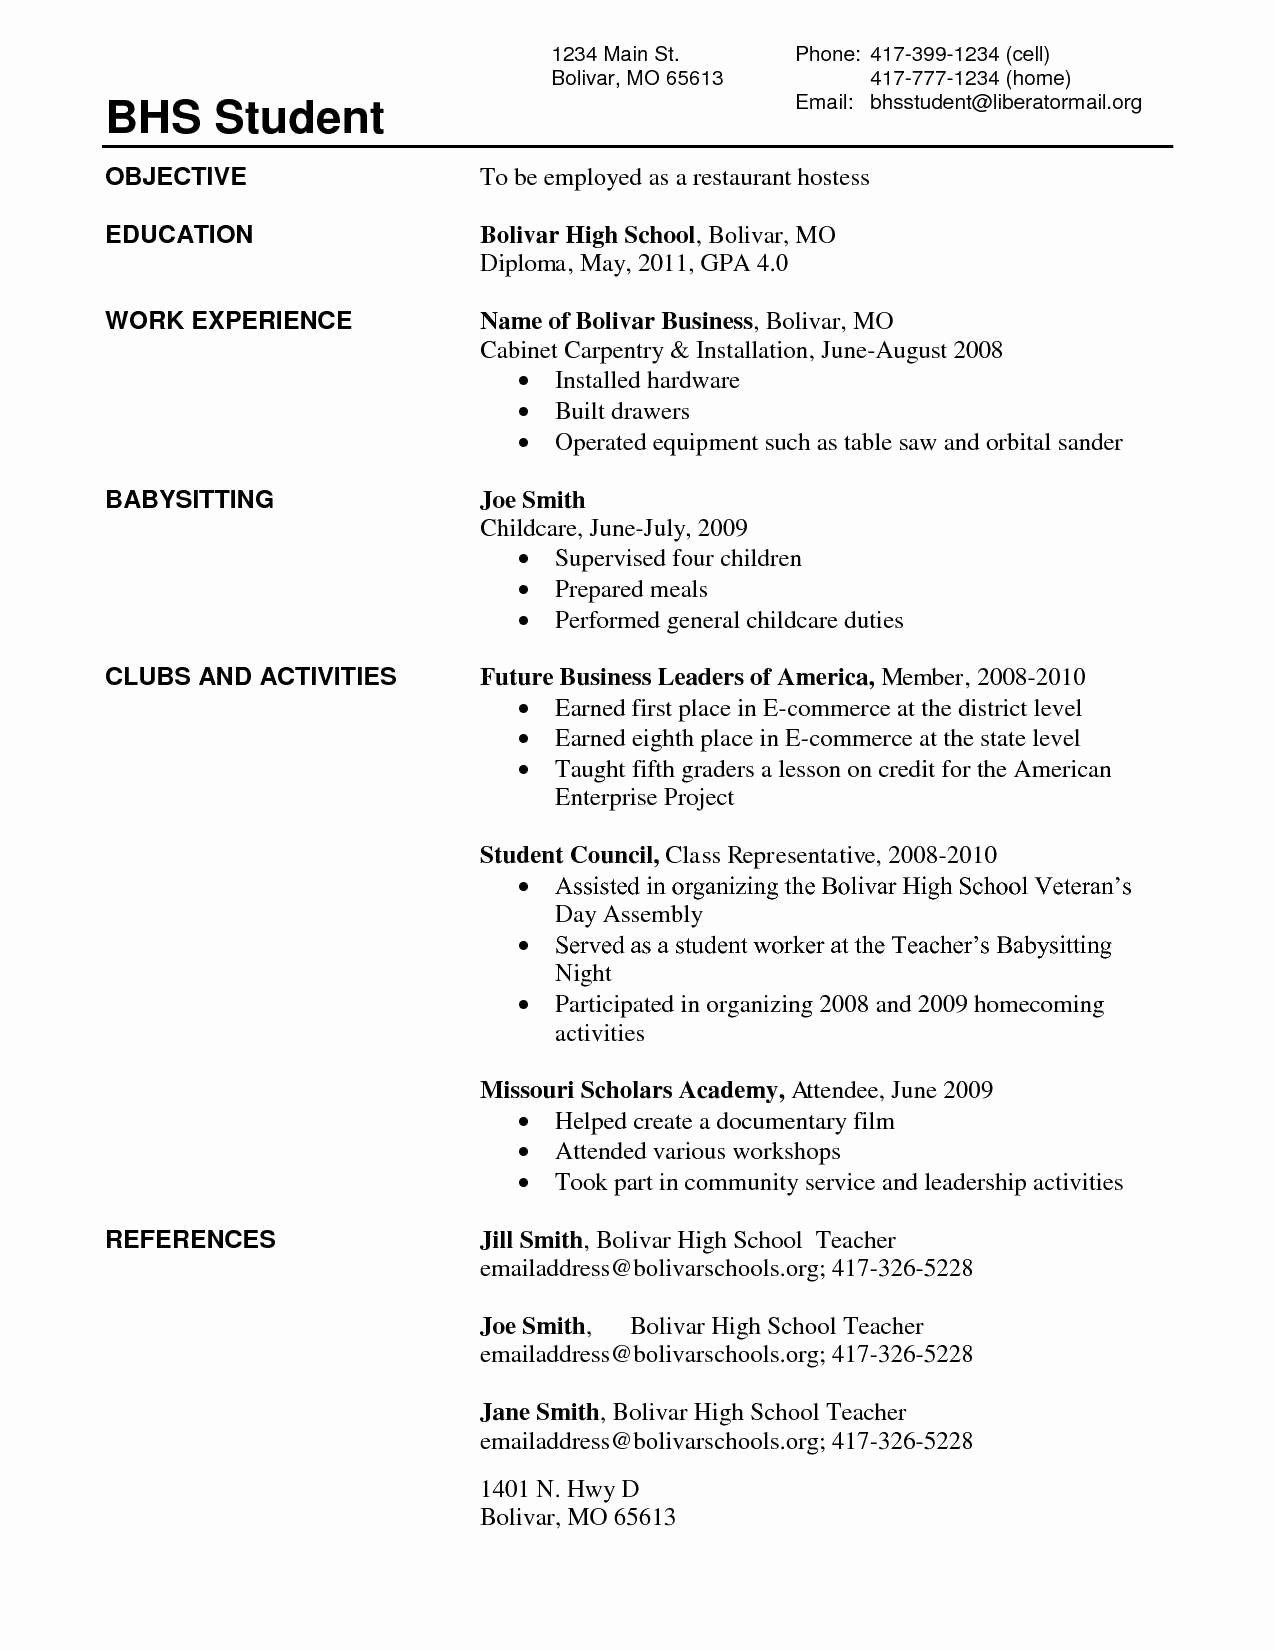 I Need Help Writing My Resume Help Writing My Resume